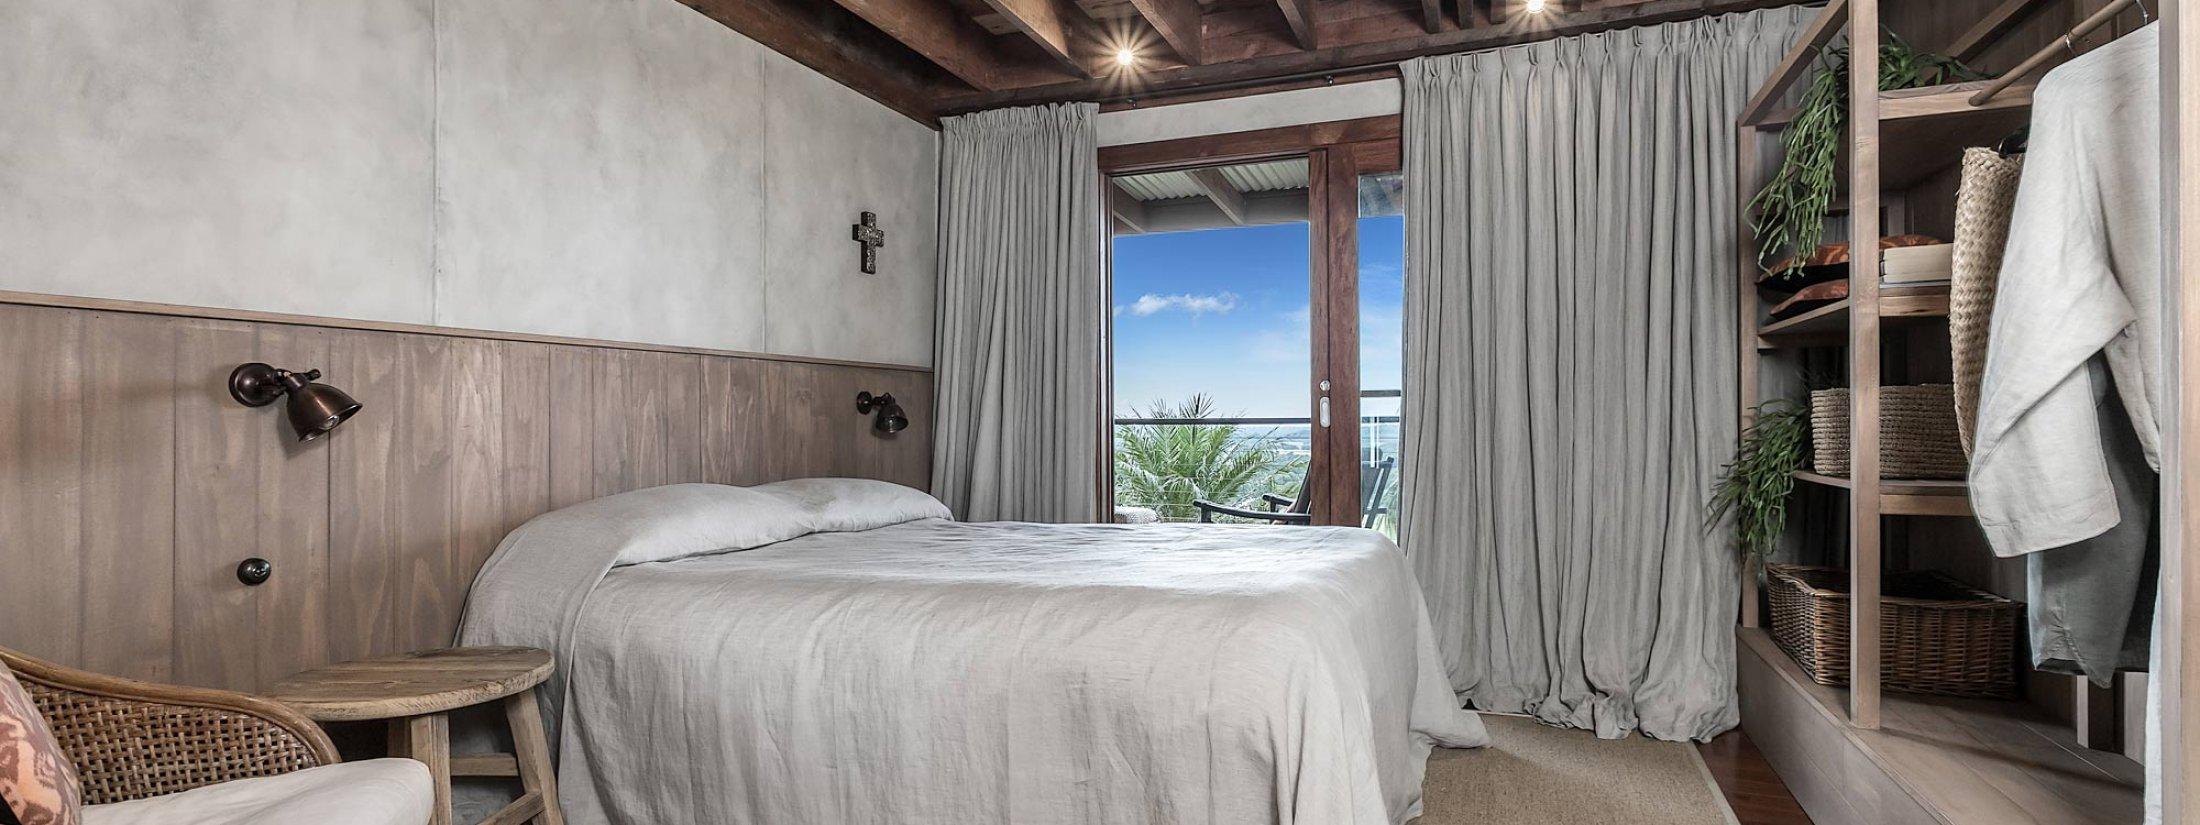 Eastern Rise - Byron Bay Hinterland - Bedroom 2